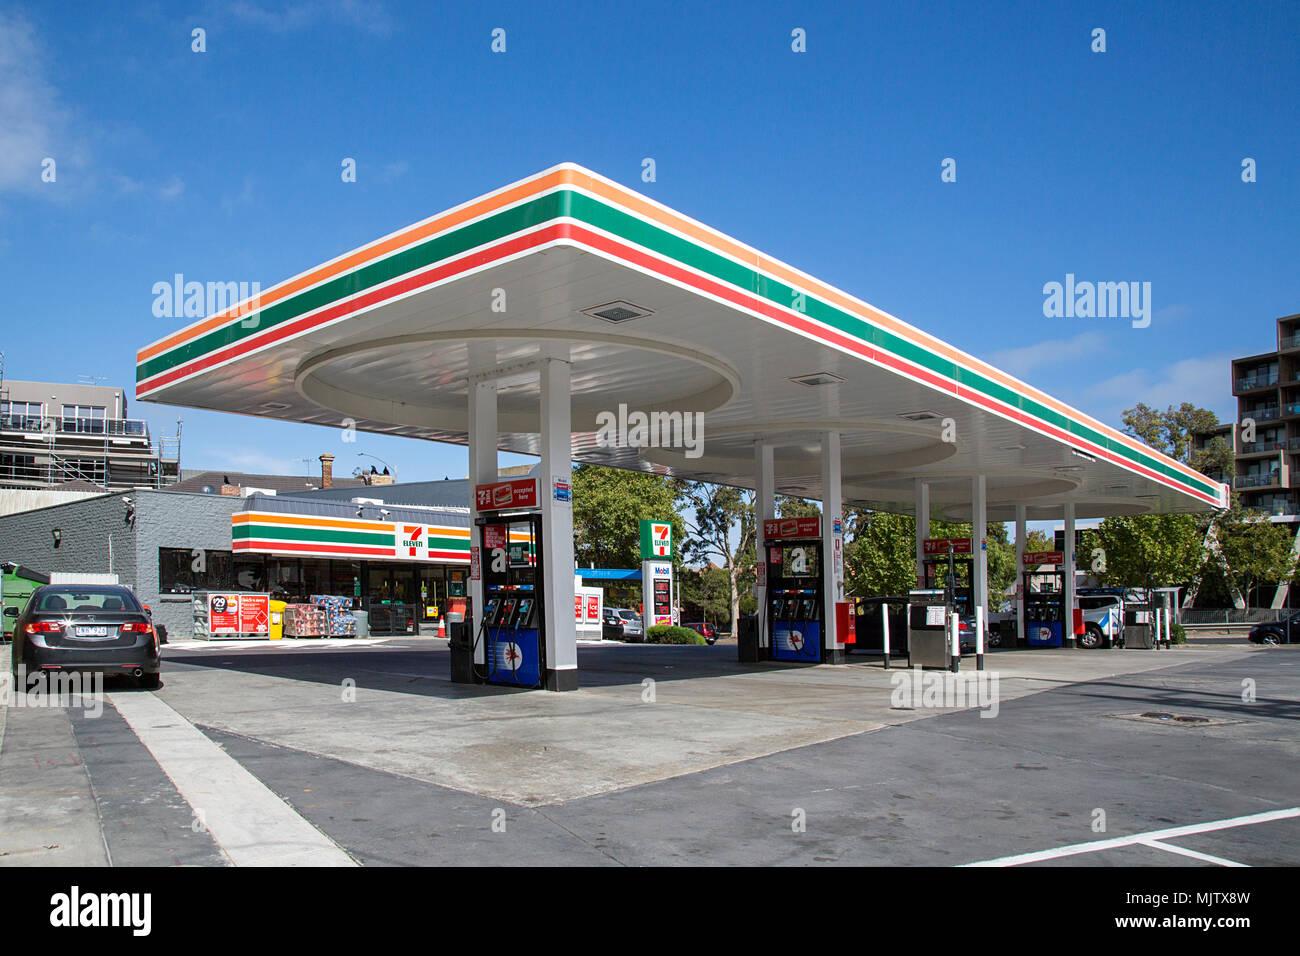 Mobil Gas Card >> Self Service Petrol Station Stock Photos & Self Service ...